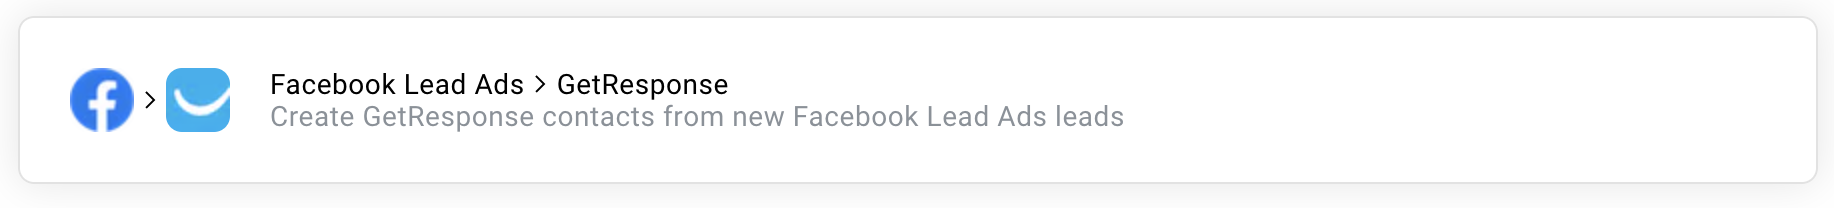 facebook lead ads getresponse zap.